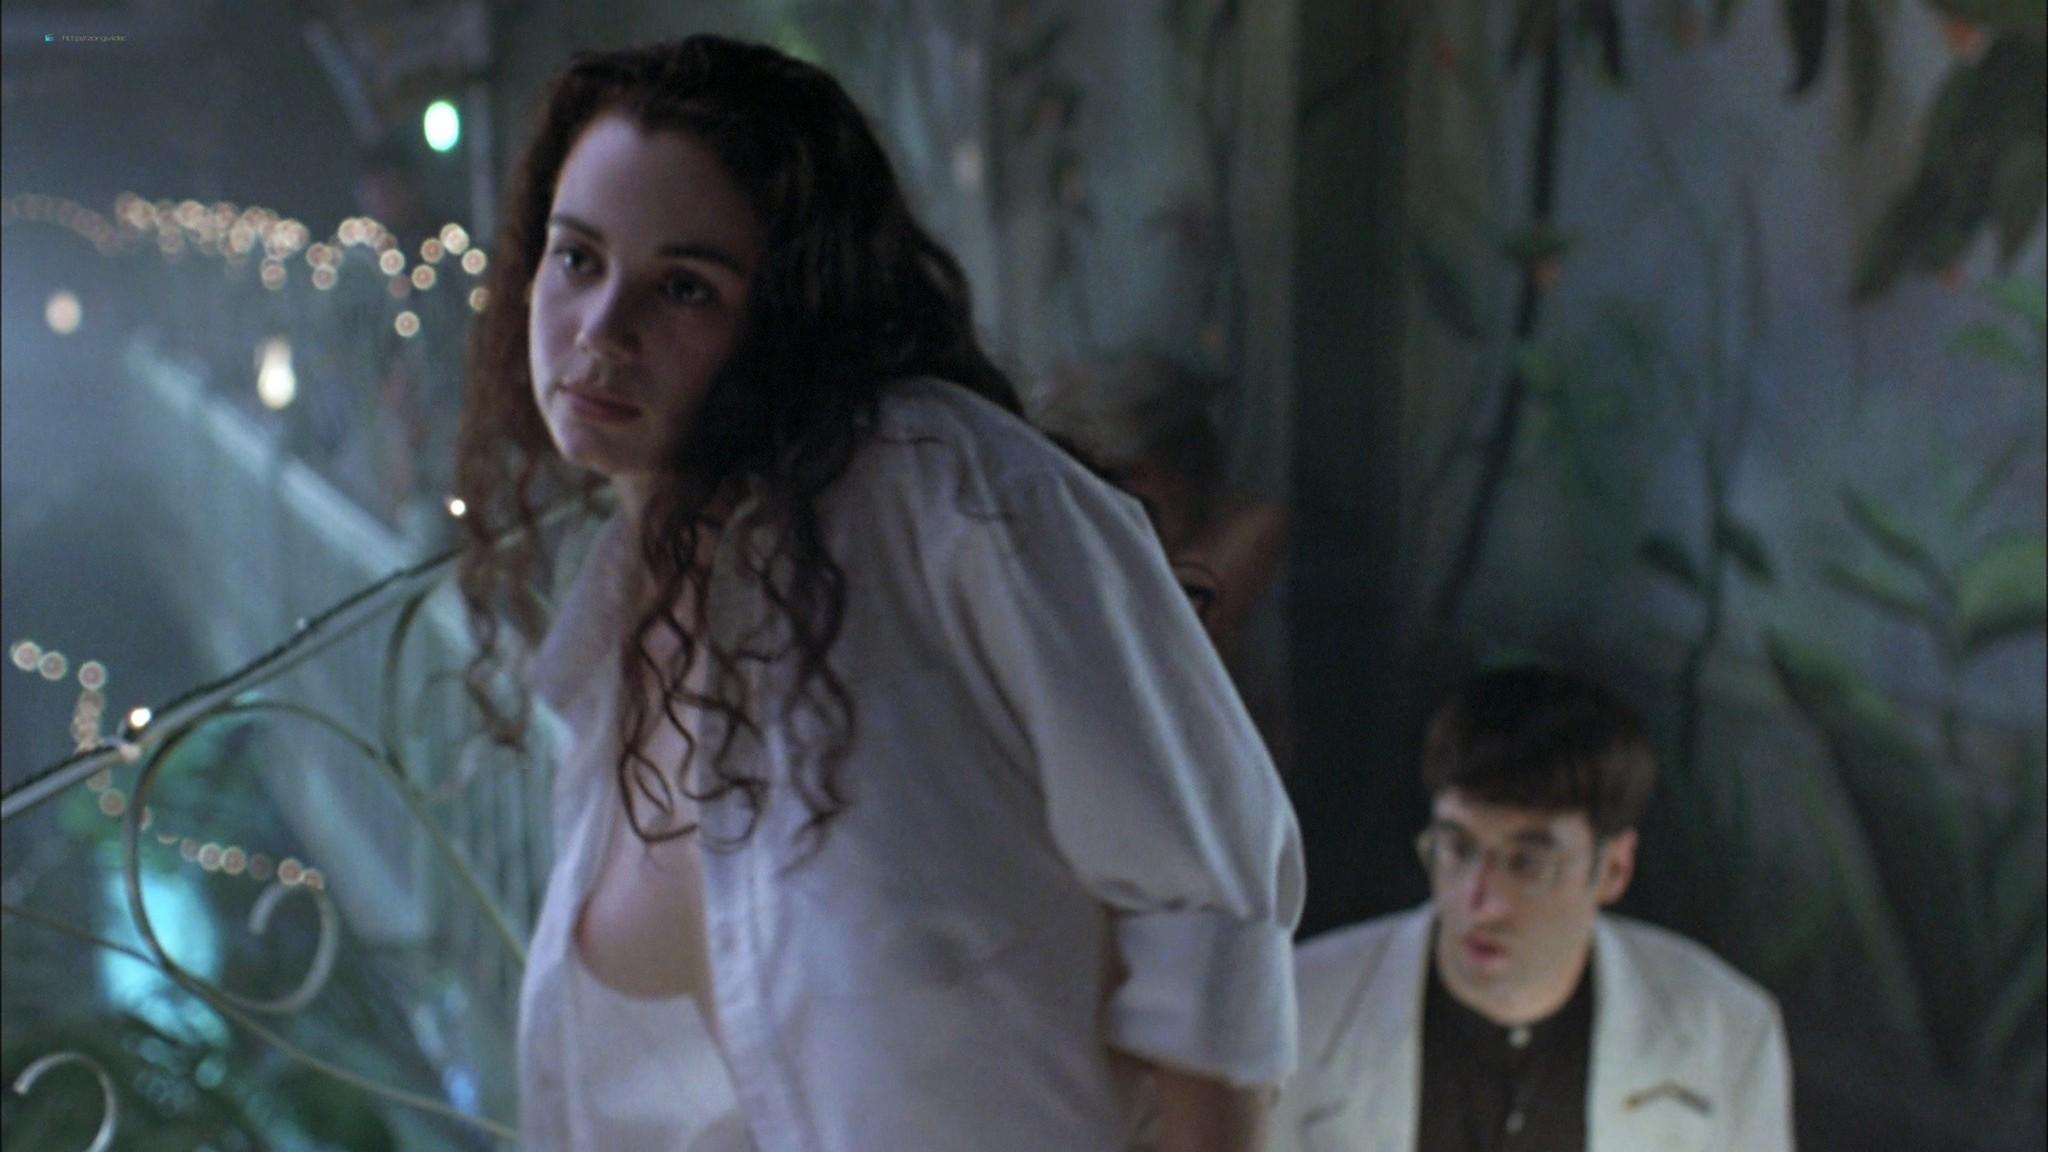 Mia Kirshner nude Arsinée Khanjian sexy - Exotica (1994) HD 1080p BluRay REMUX (5)